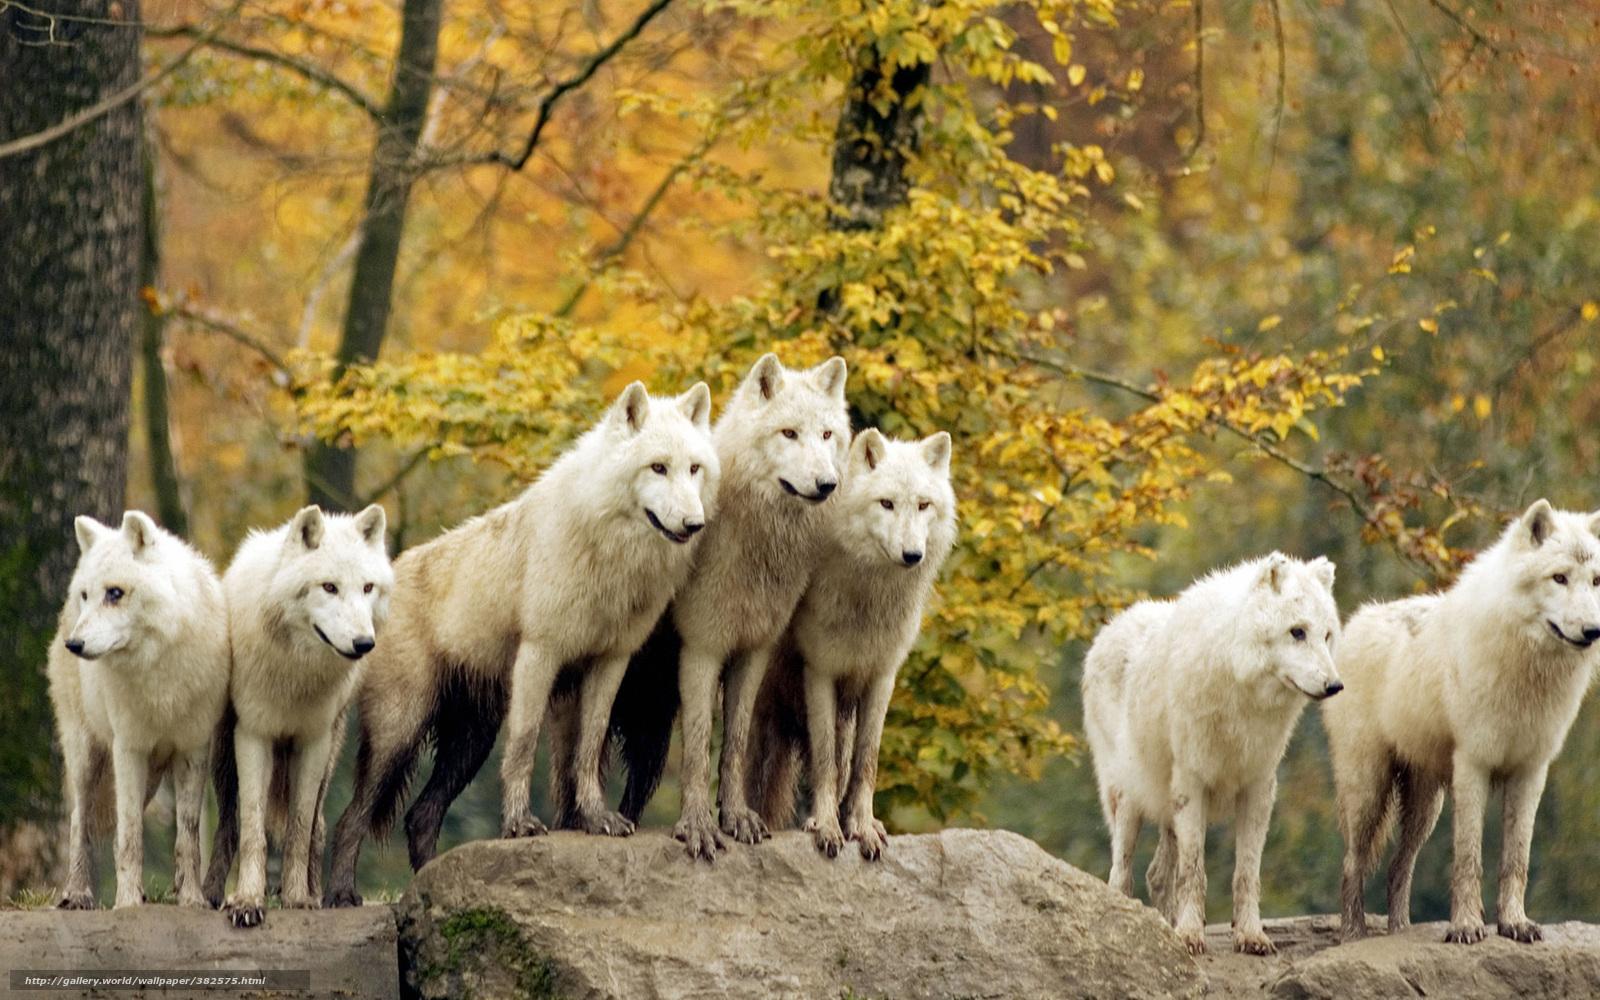 Картинка волки целуются - 6771